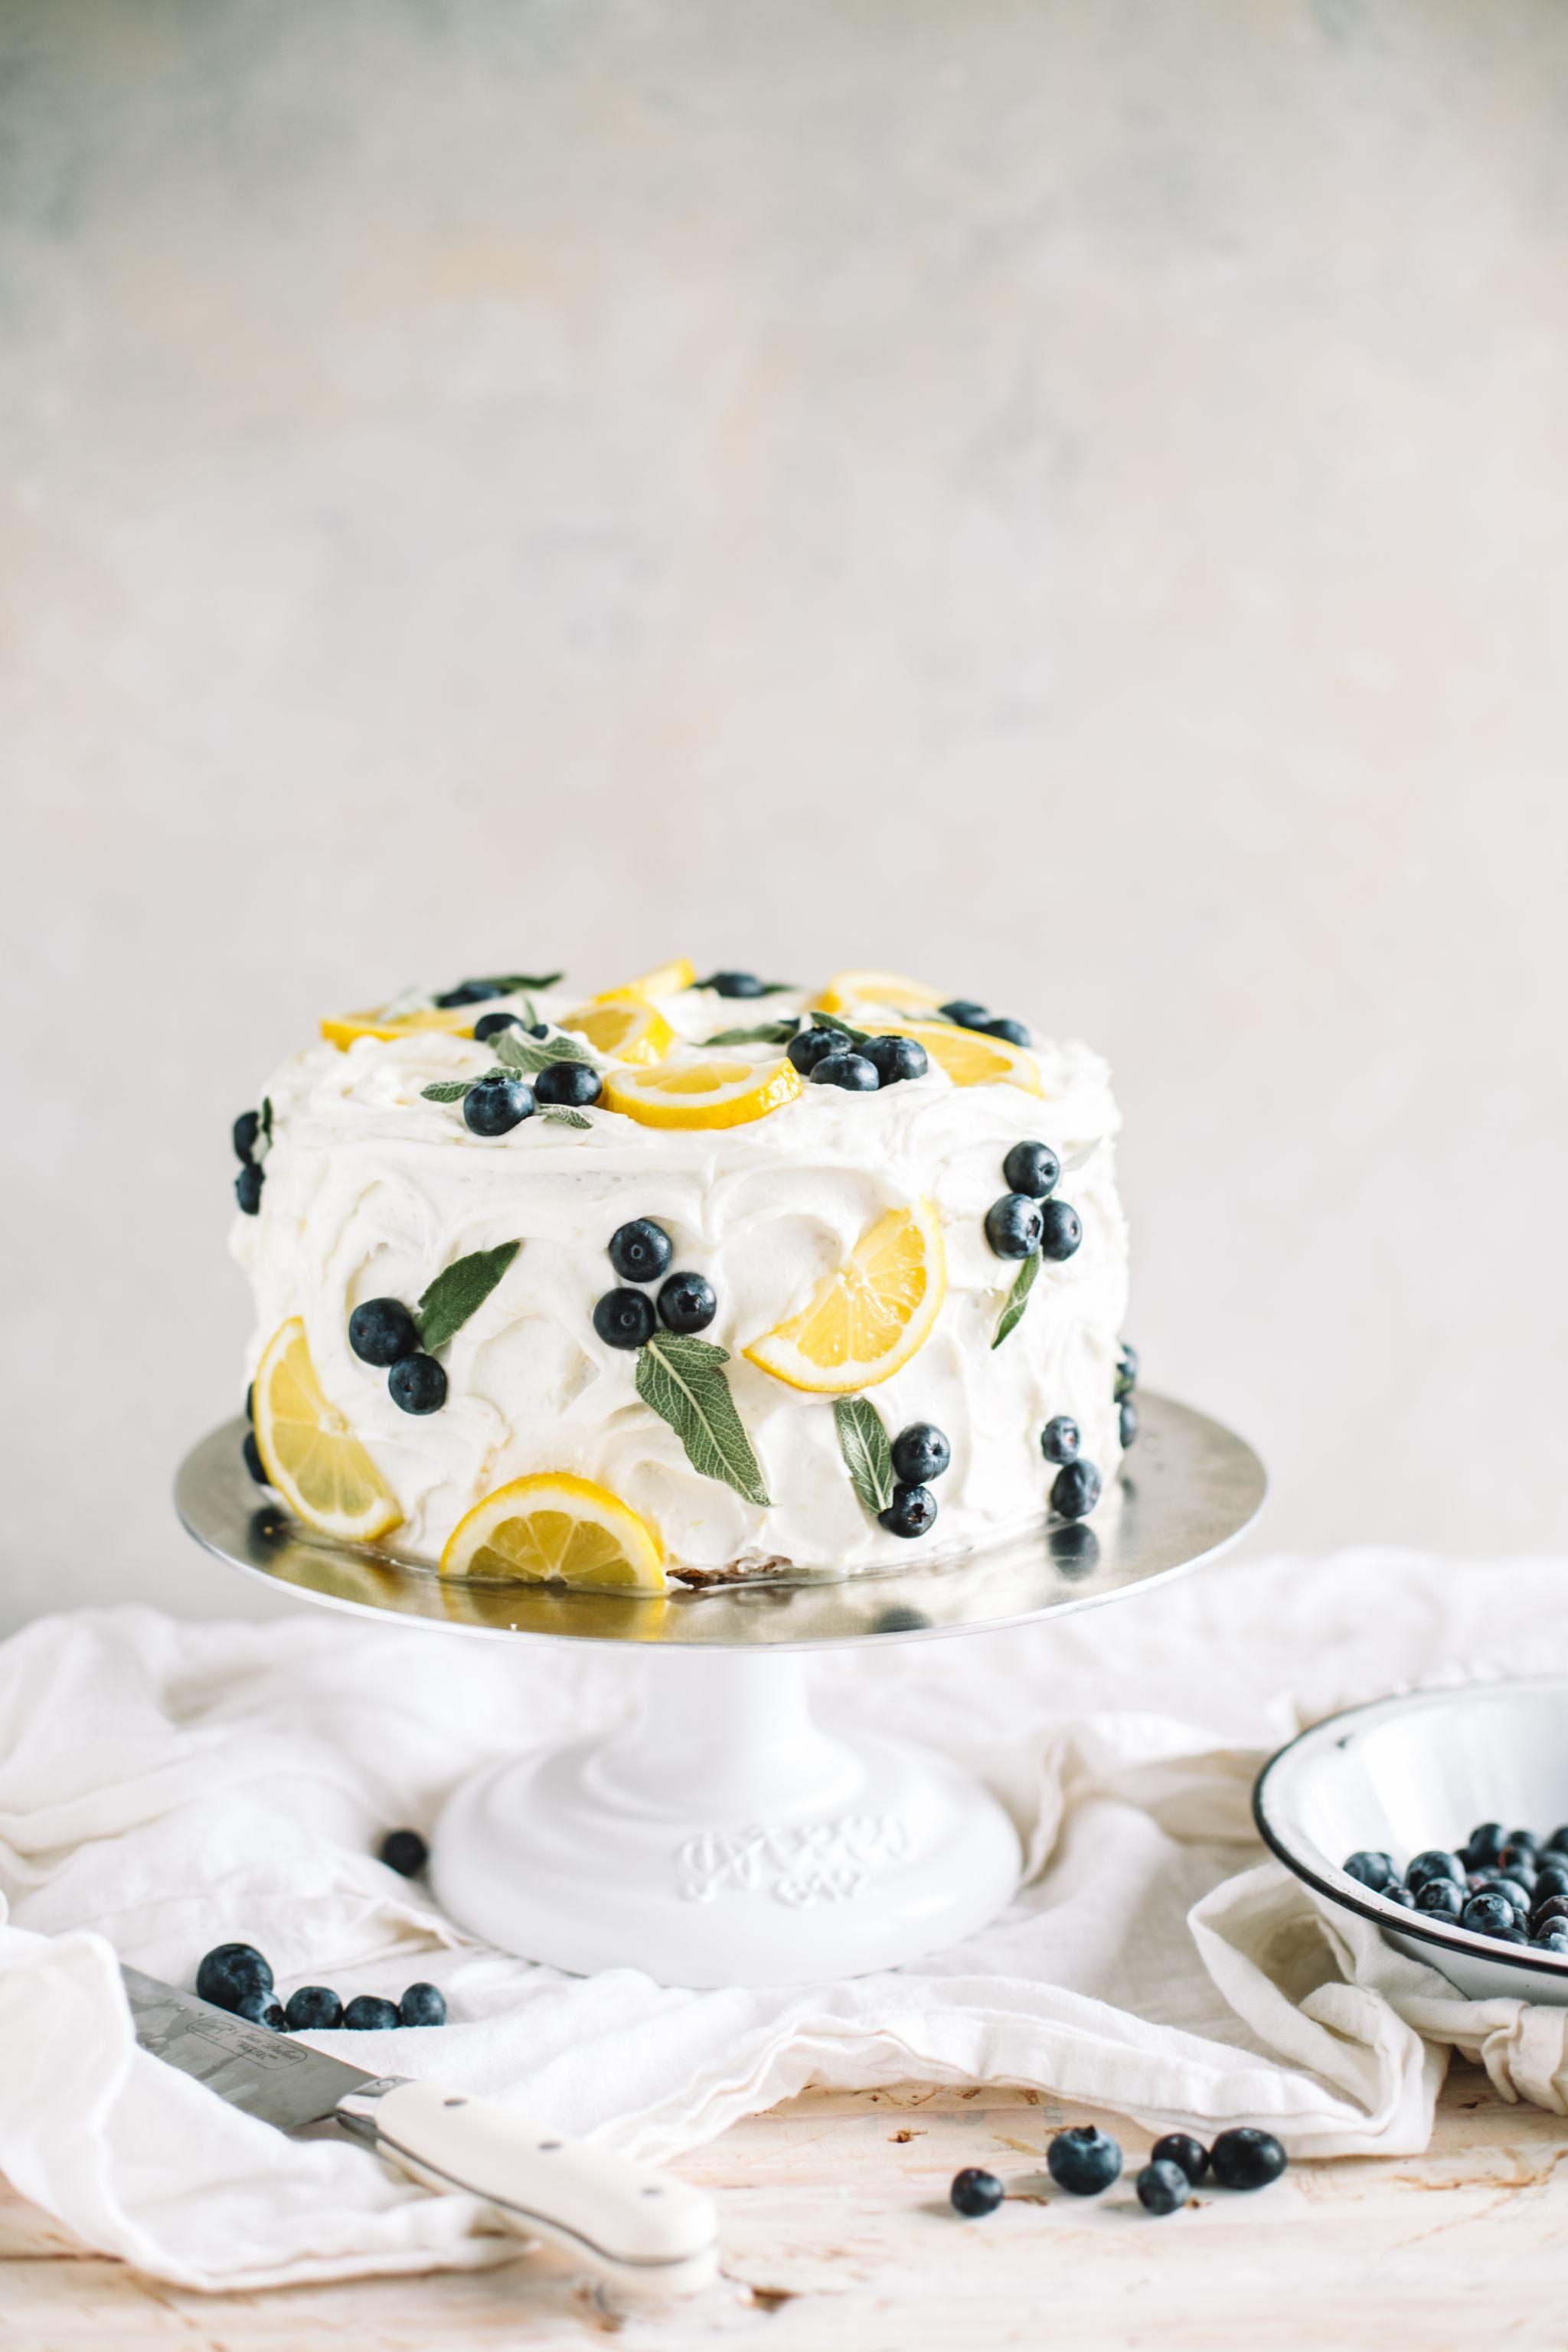 Lemon Blueberry Cake With Lemon Buttercream The College Housewife Recipe Desserts Blueberry Cake Blueberry Lemon Cake